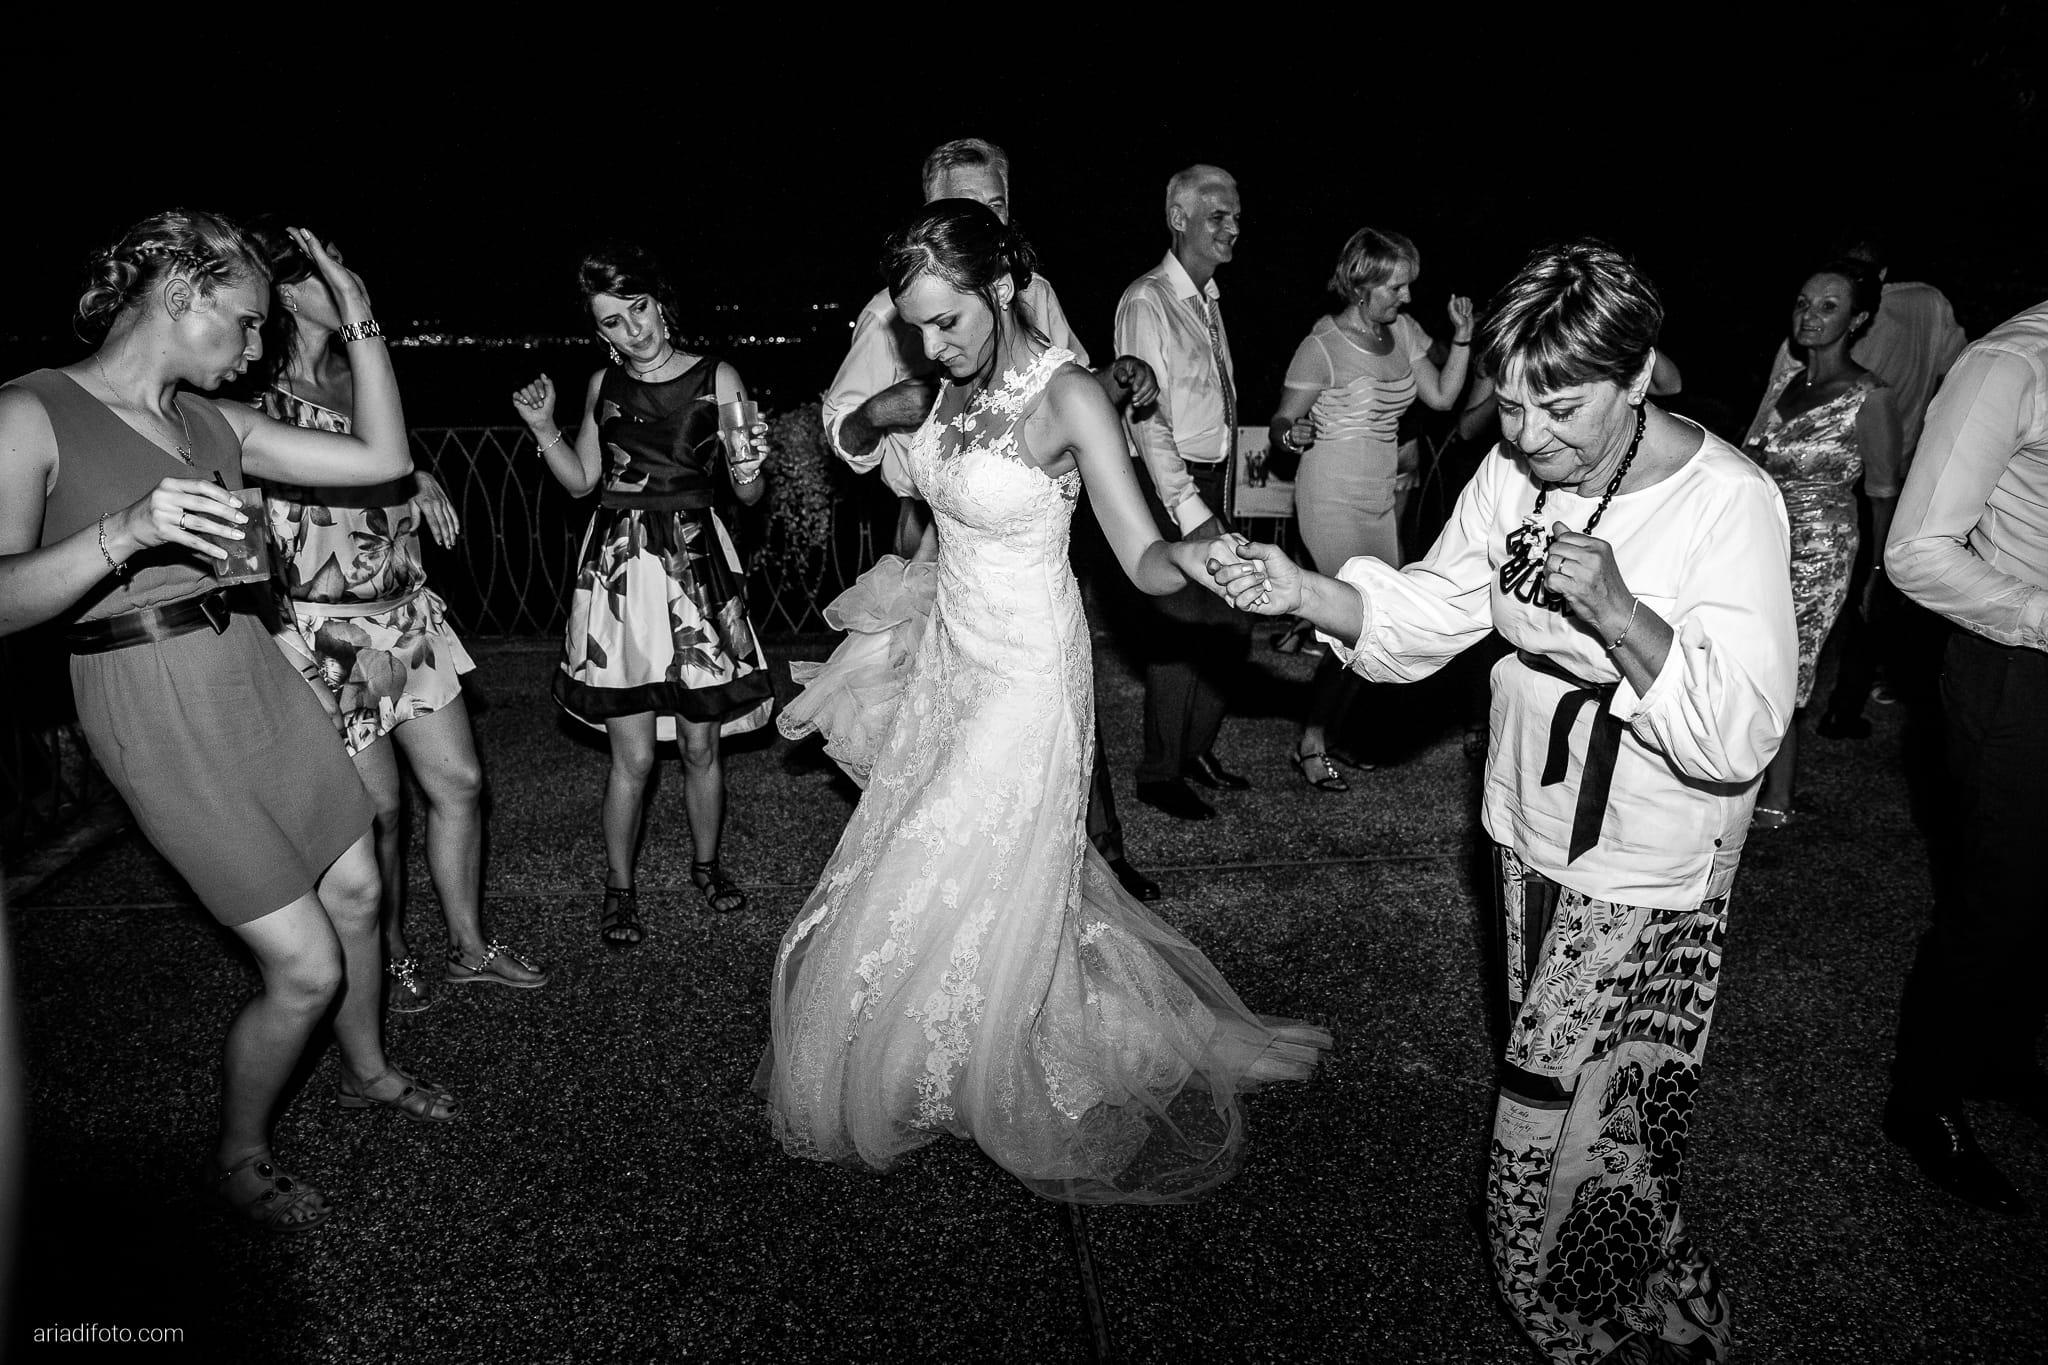 Valentina Marco Matrimonio Duomo Gorizia Castelvecchio Sagrado ricevimento balli party festa